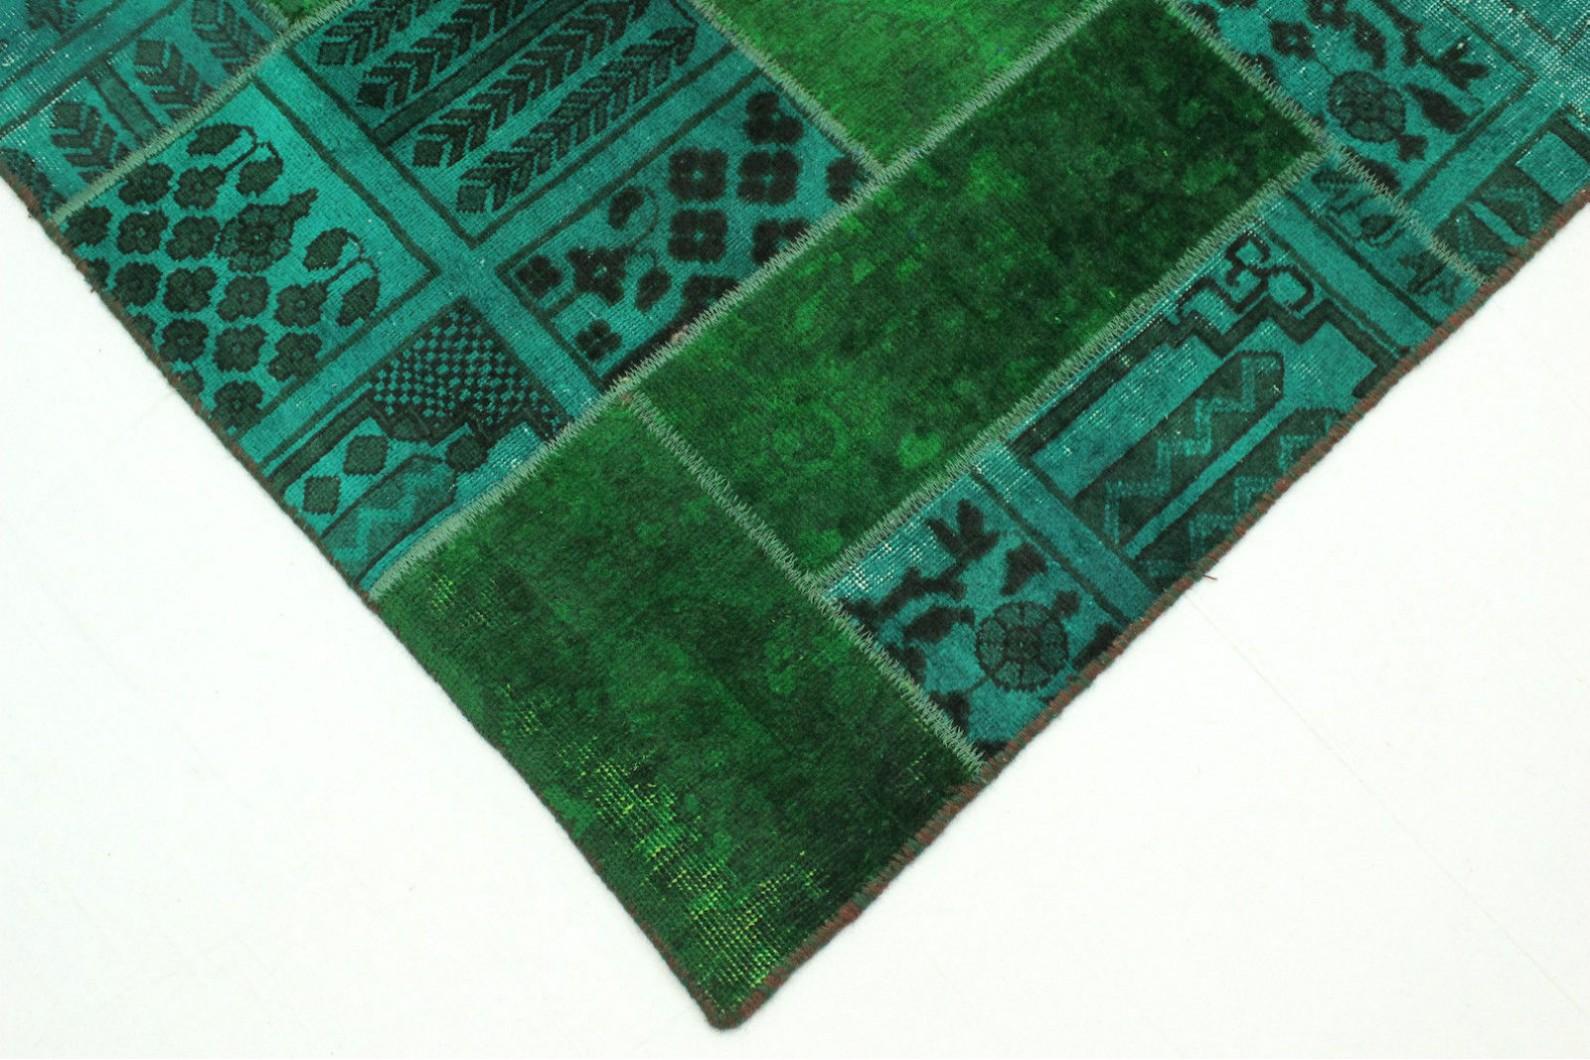 patchwork teppich gr n t rkis in 310x200cm 1001 1948 bei kaufen. Black Bedroom Furniture Sets. Home Design Ideas